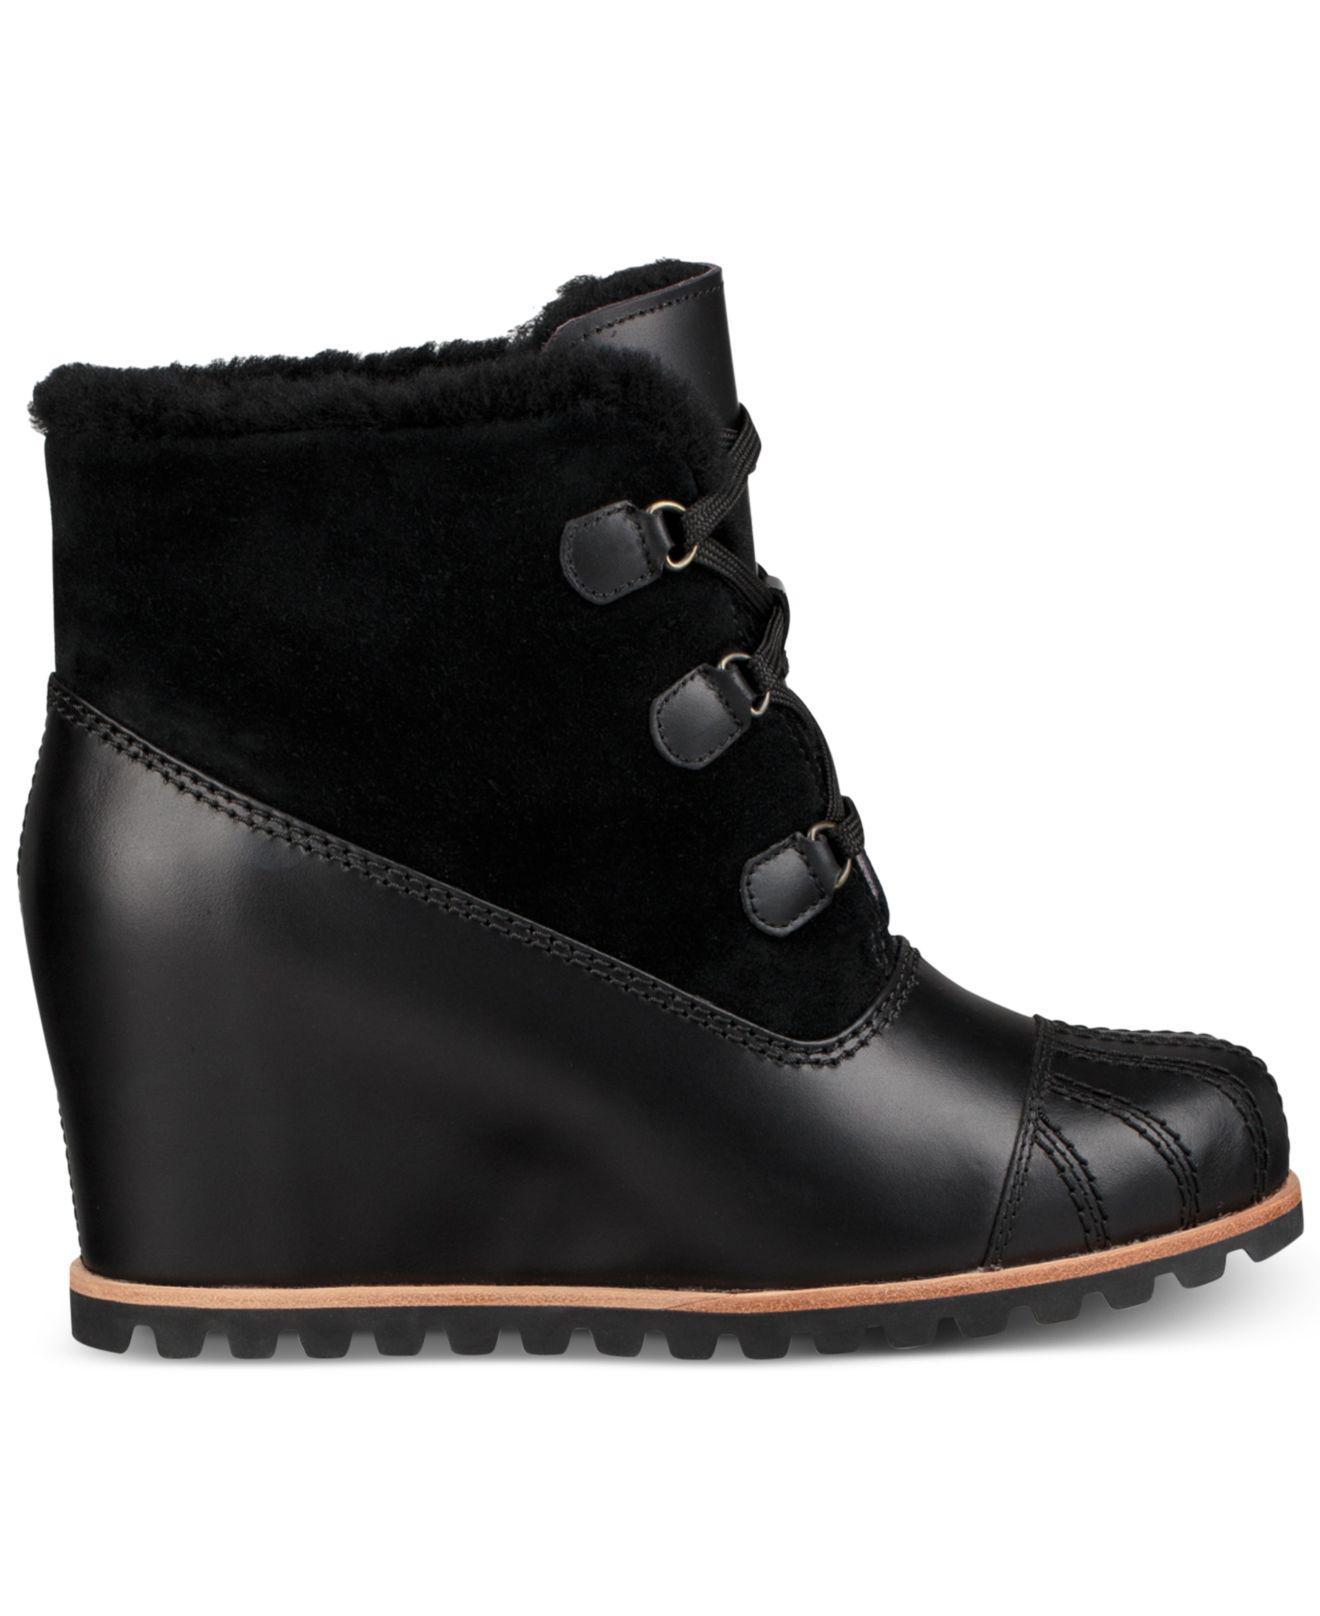 552efaa496e Lyst - UGG Alasdair Wedge Ankle Booties in Black